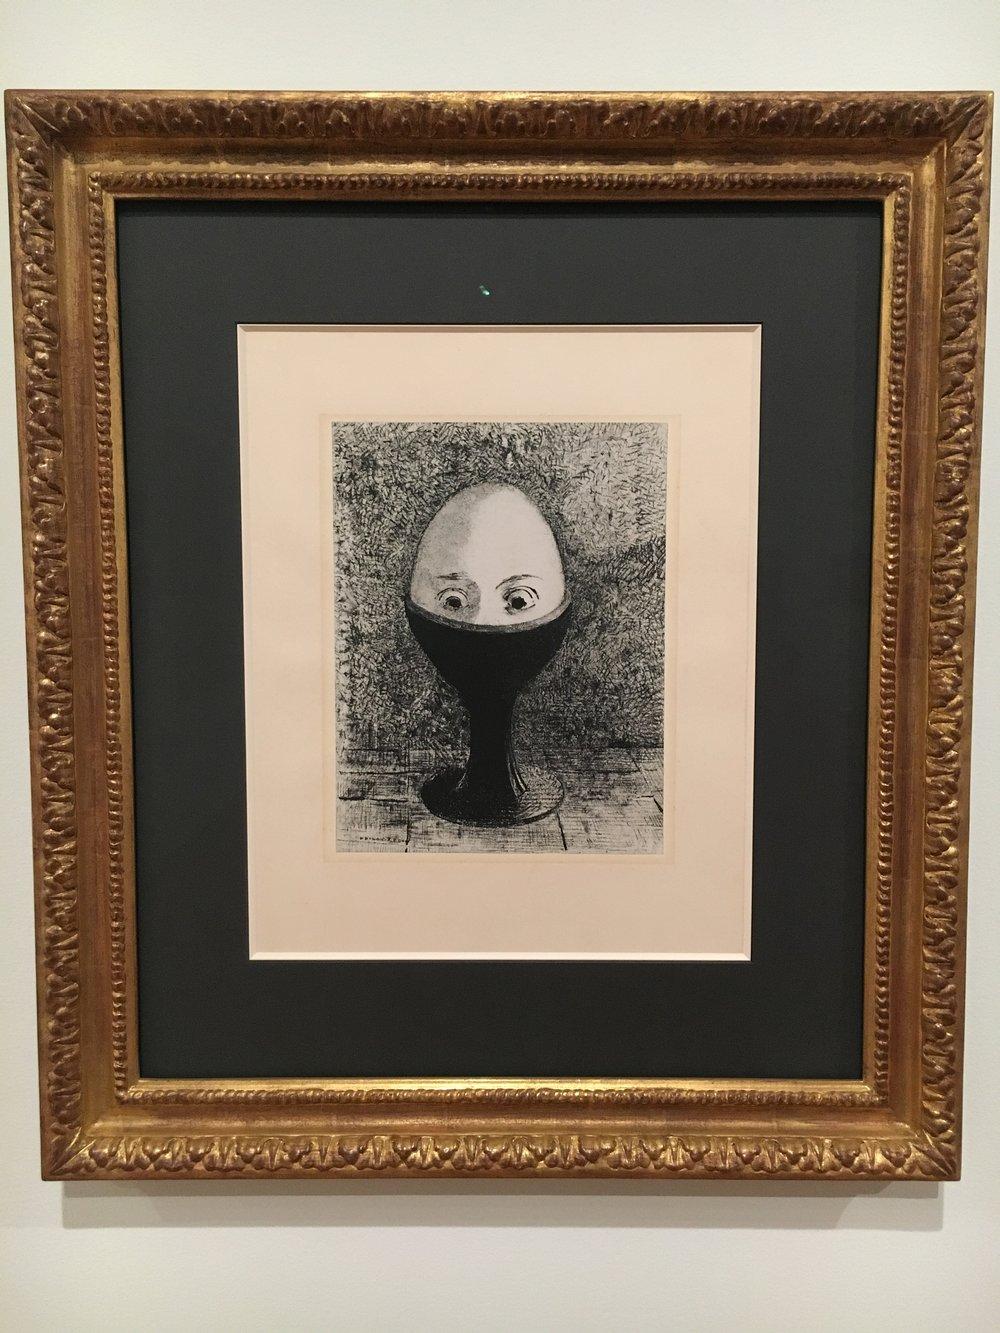 The Egg (1885)